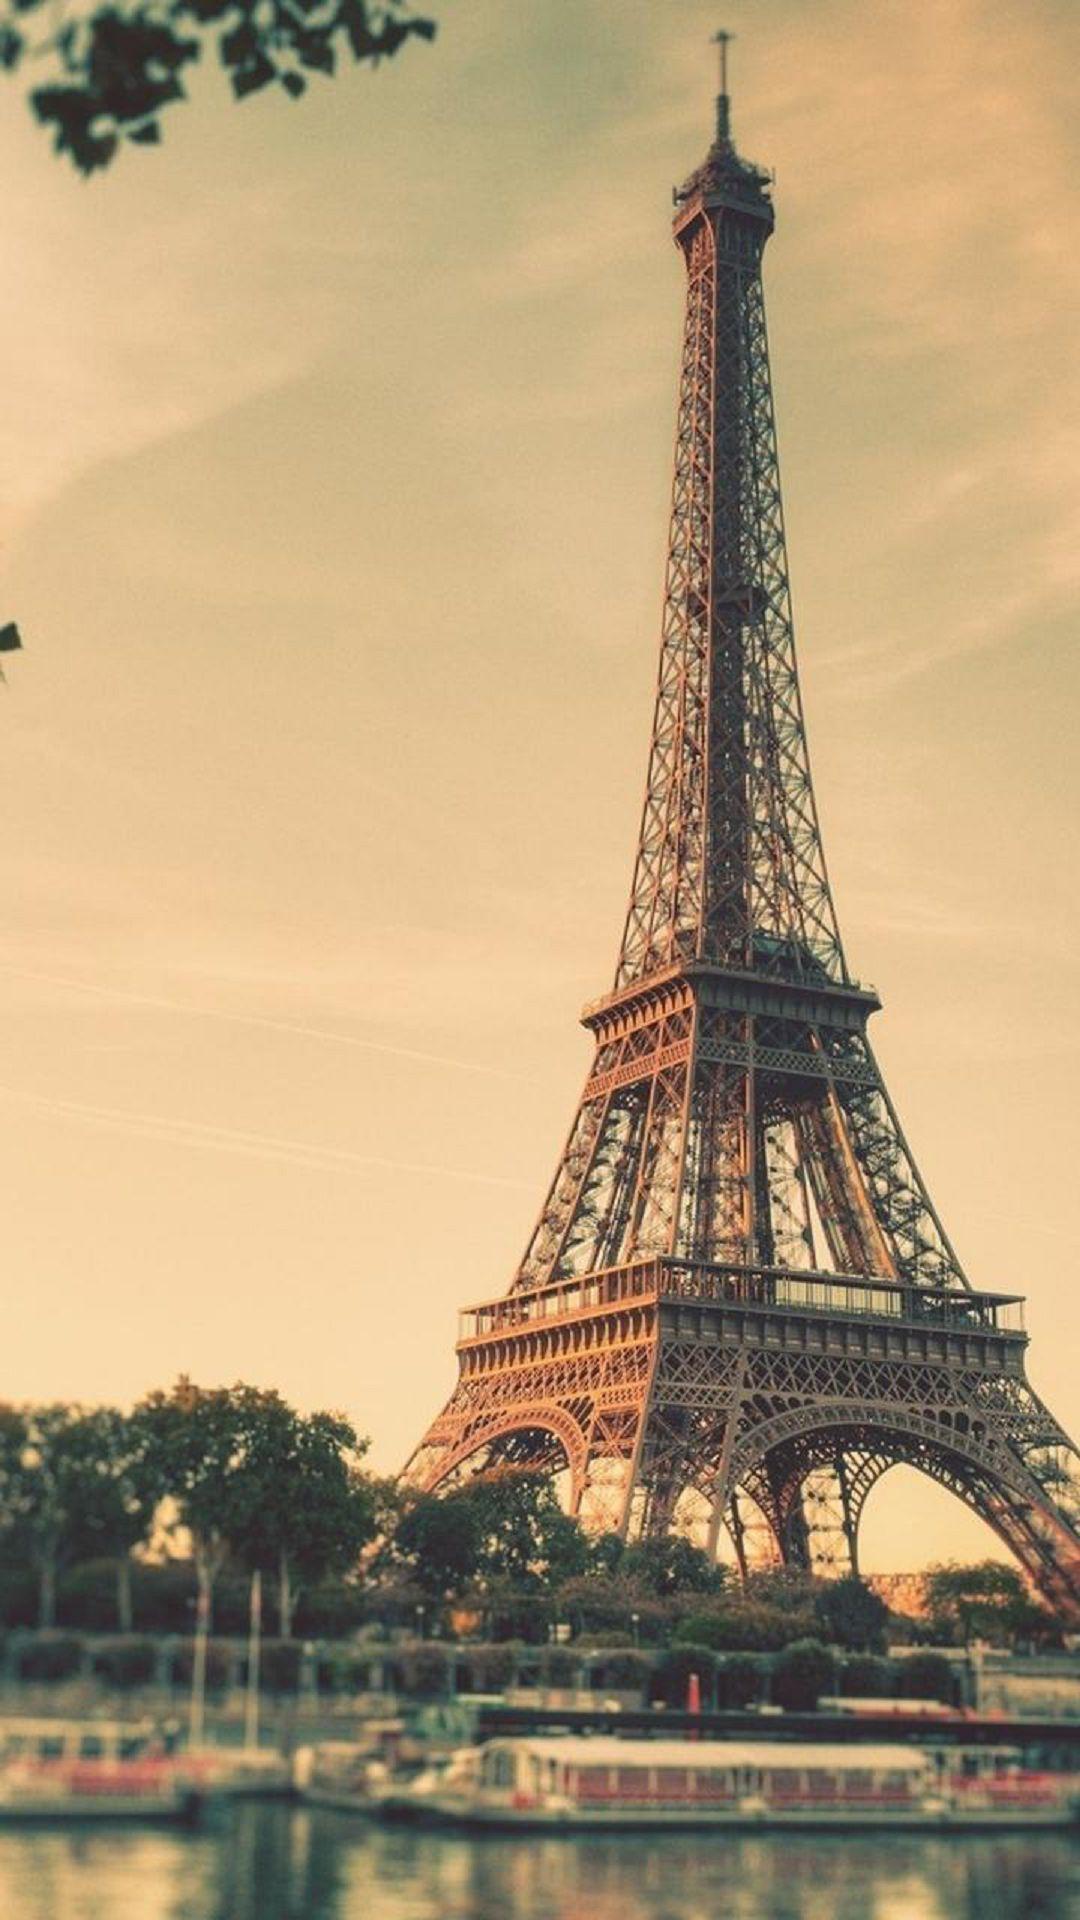 Eiffel Tower Paris Sunrise Tilt Shift | HTC One wallpaper | Pinterest